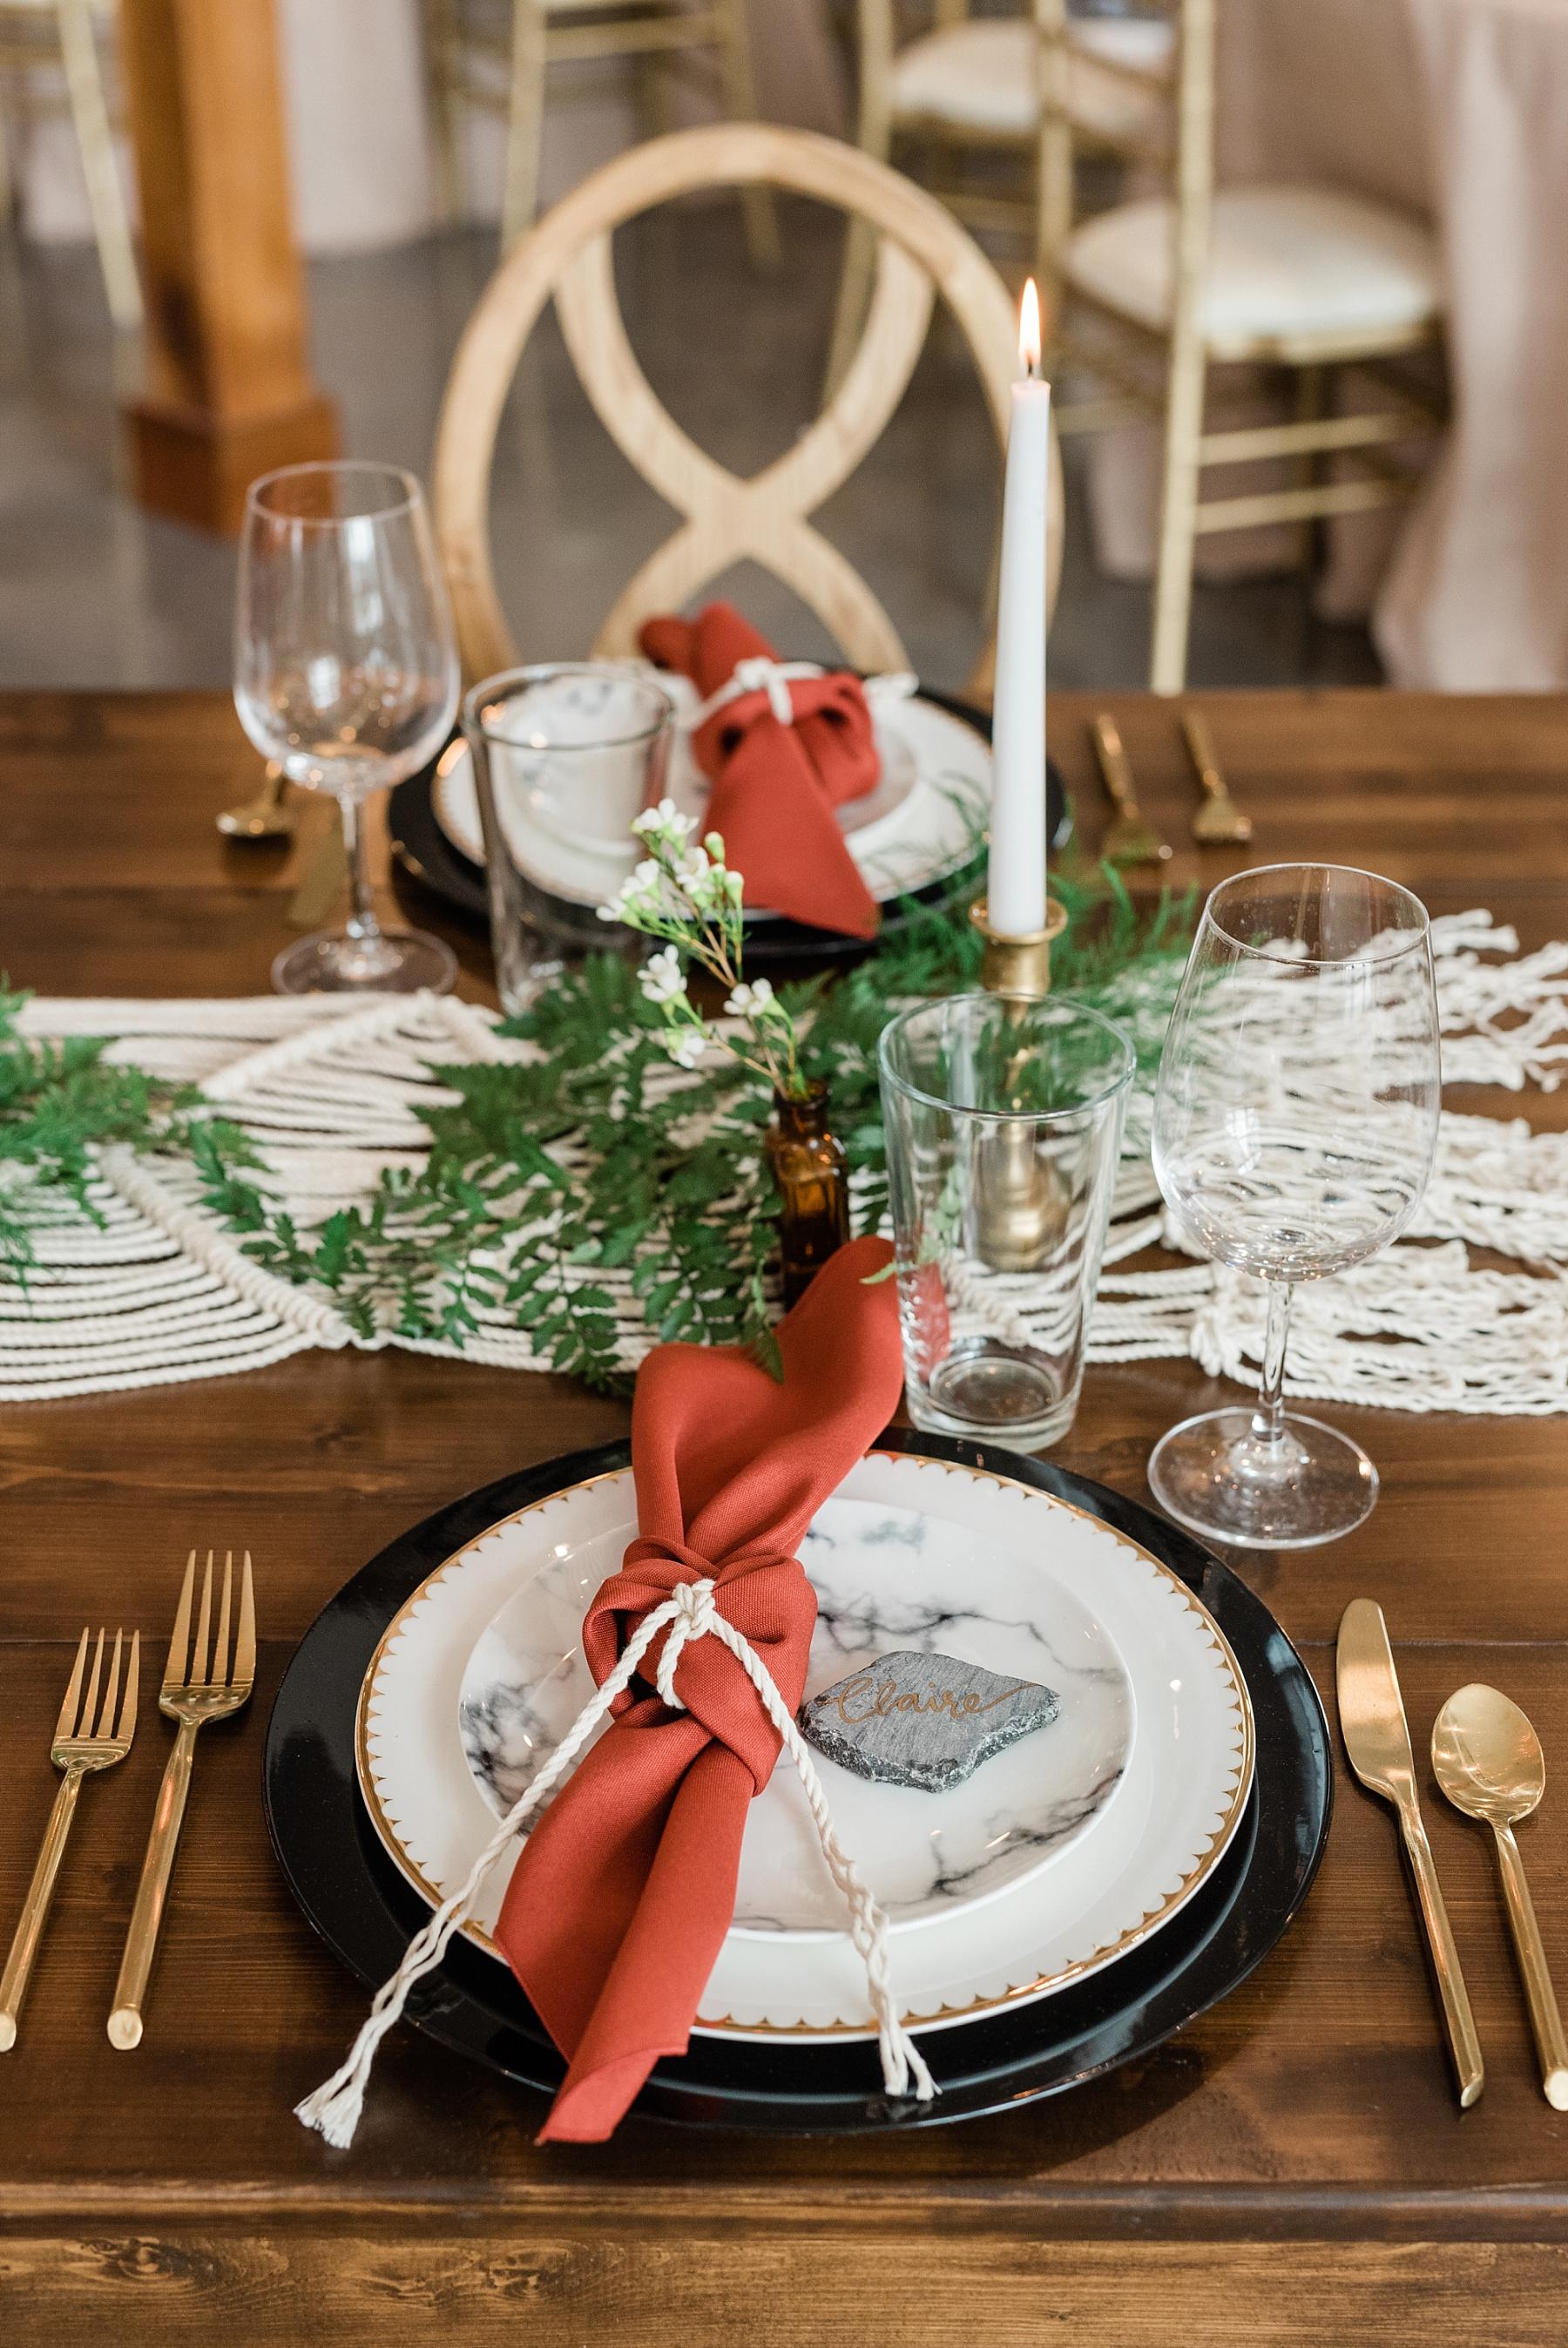 Eclectic Scandinavian Winter Wedding in All White Venue Emerson Fields by Kelsi Kliethermes Photography Best Missouri and Maui Wedding Photographer_0090.jpg